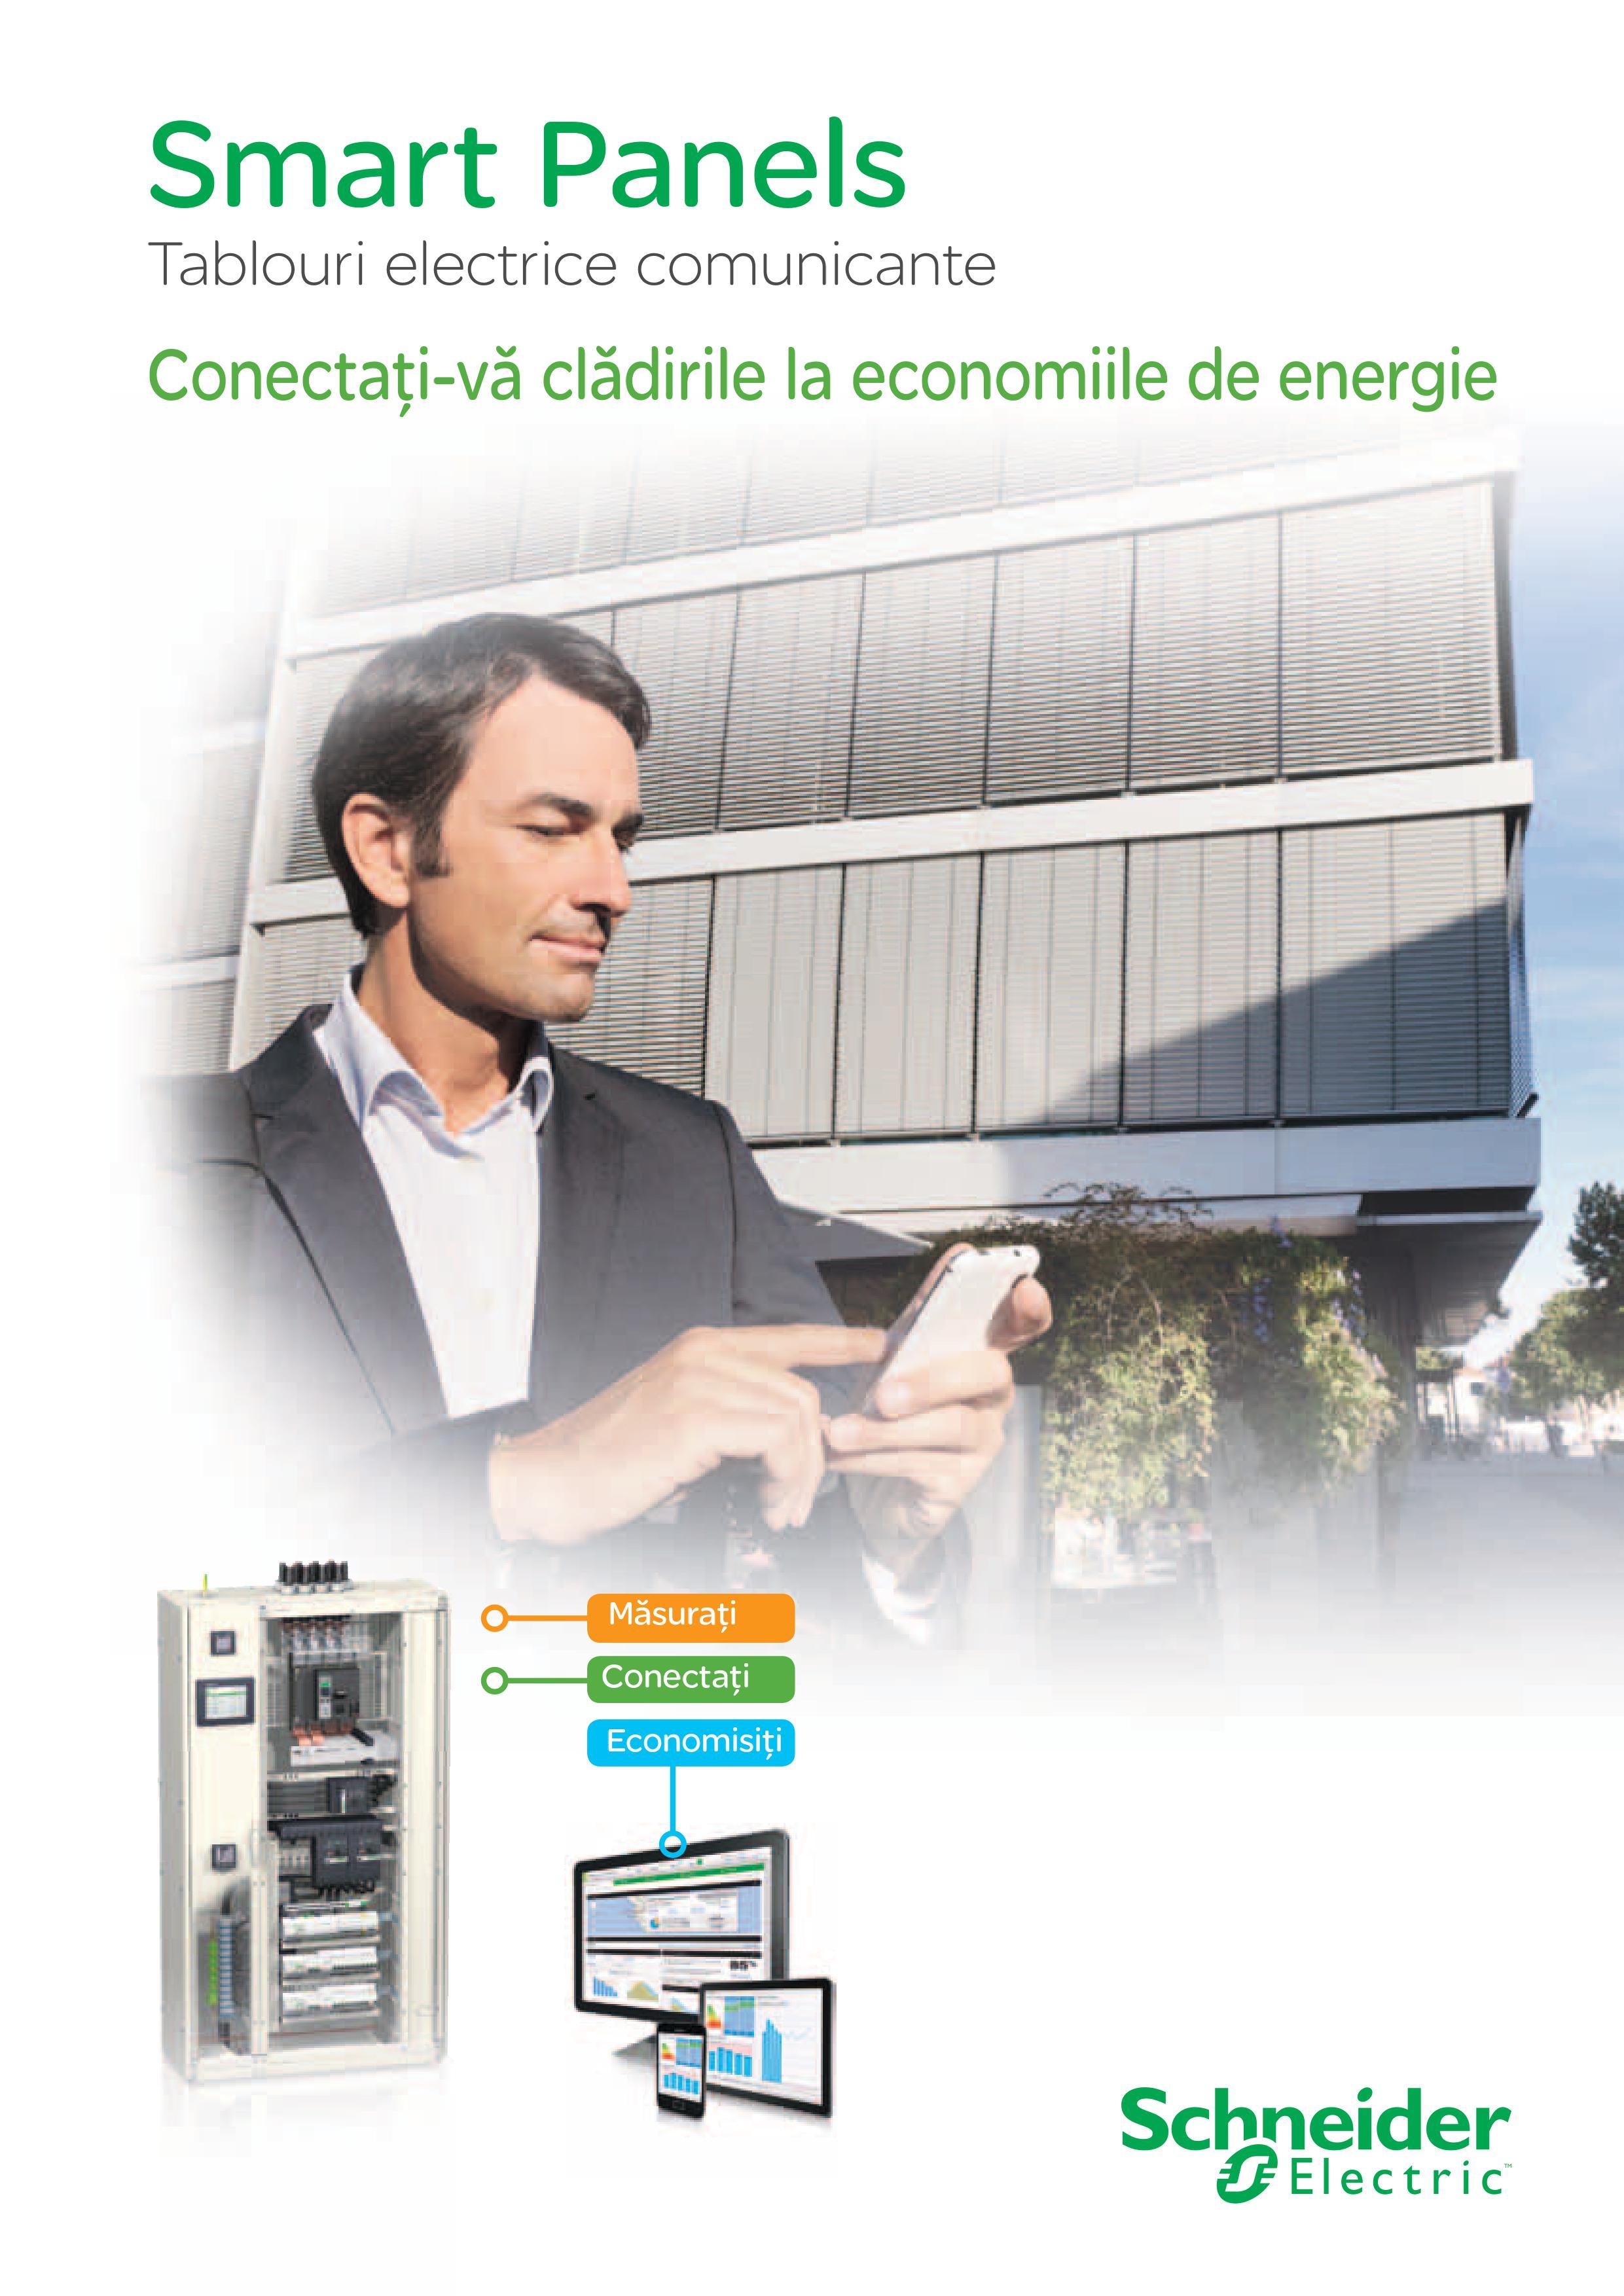 Schneider Electric lanseaza solutia Smart Panel